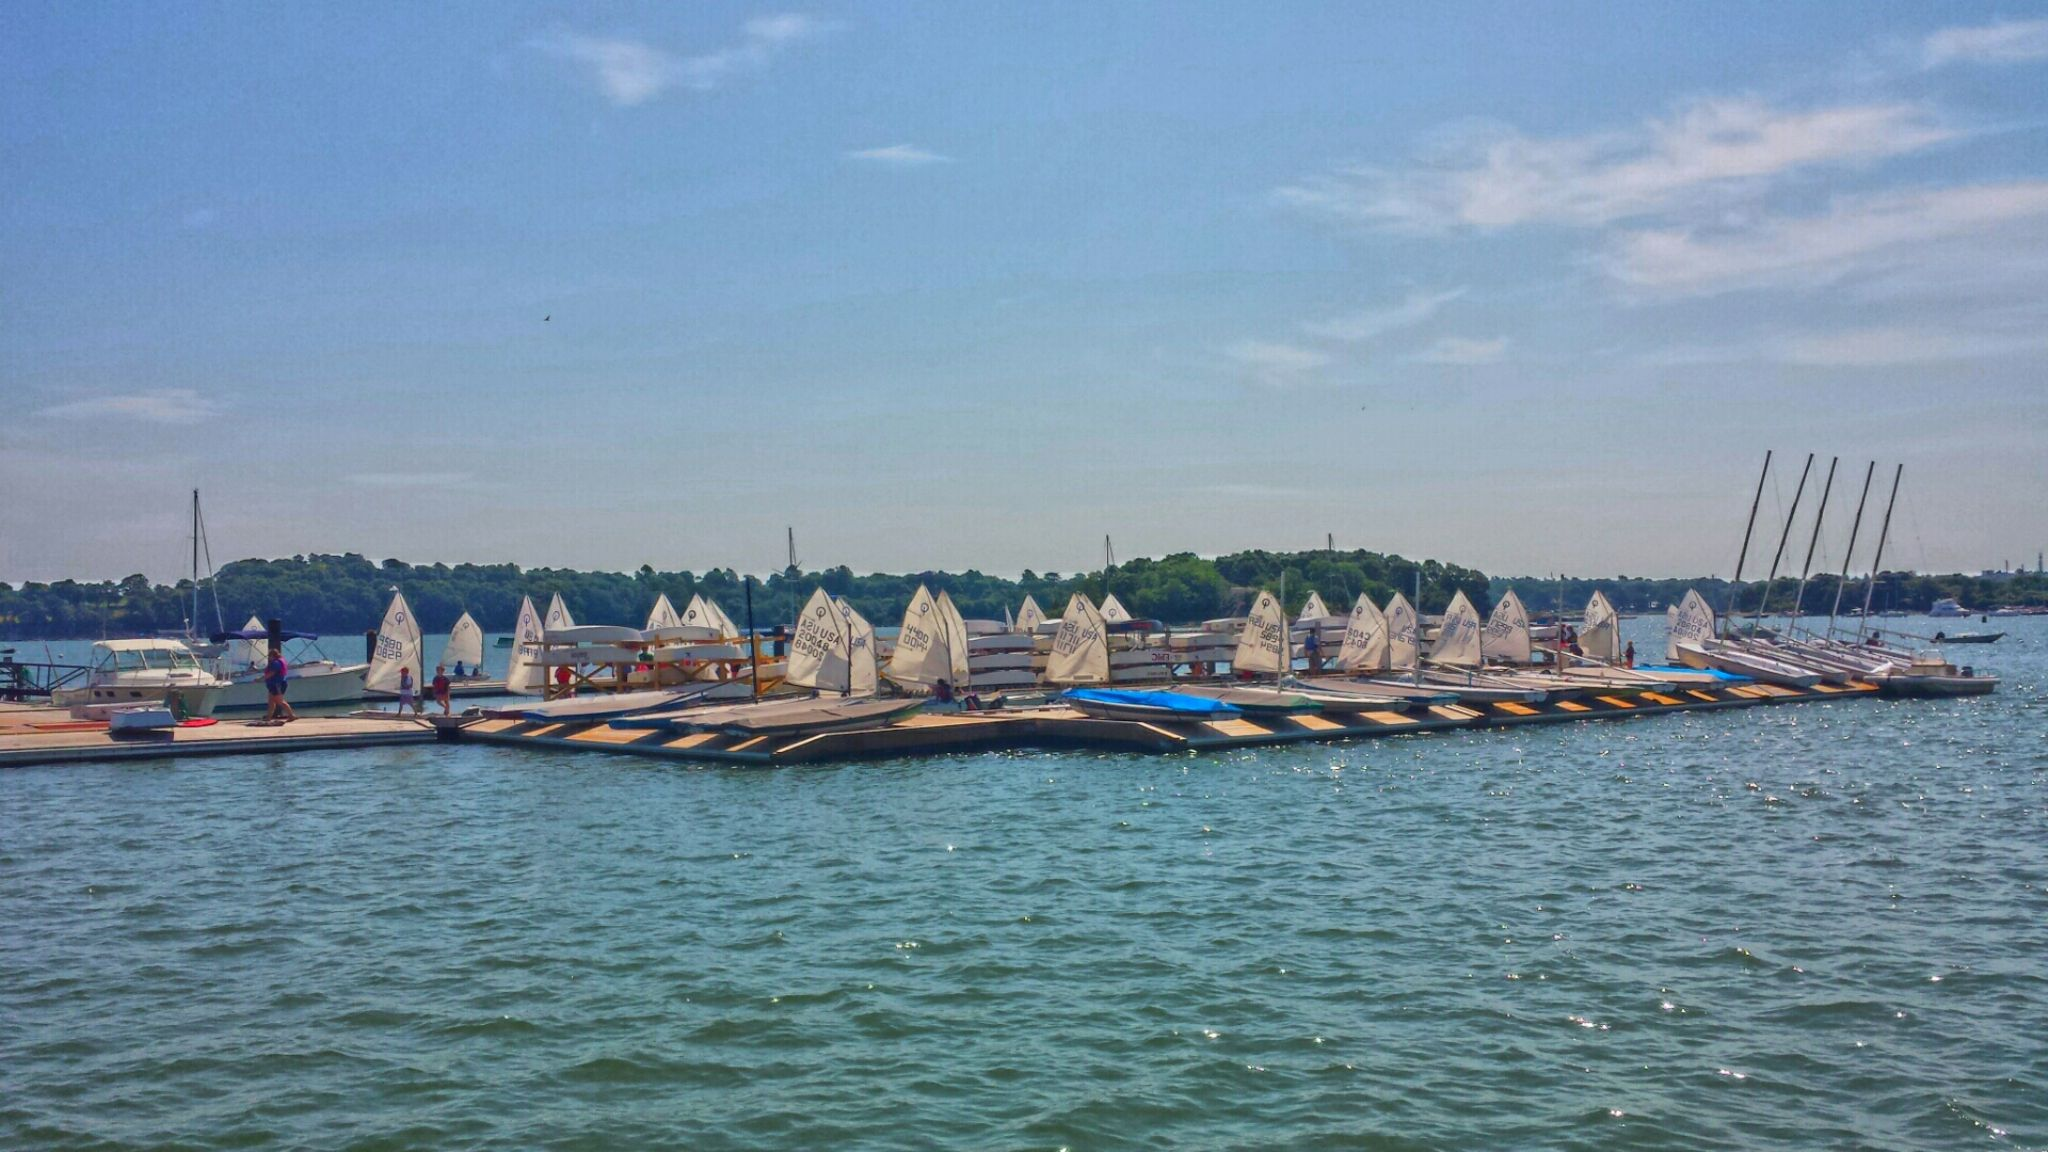 yacht club beginning of  Summer by karajean17